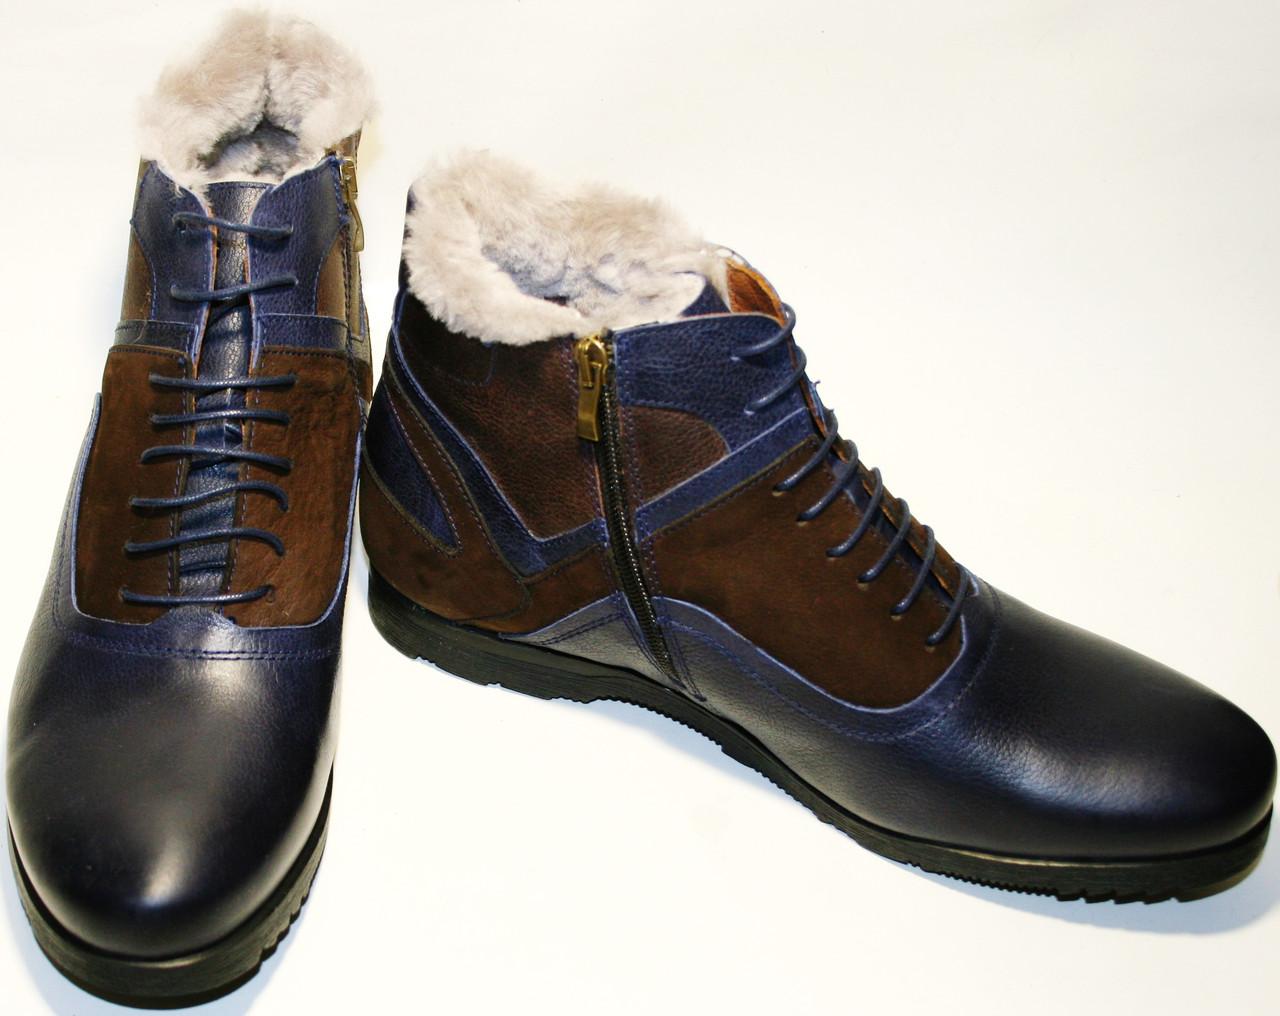 c6d664e31 Ботинок зимний мужской Luciano Bellini 05319 классические,  синие/коричневые, молния/шнурок,